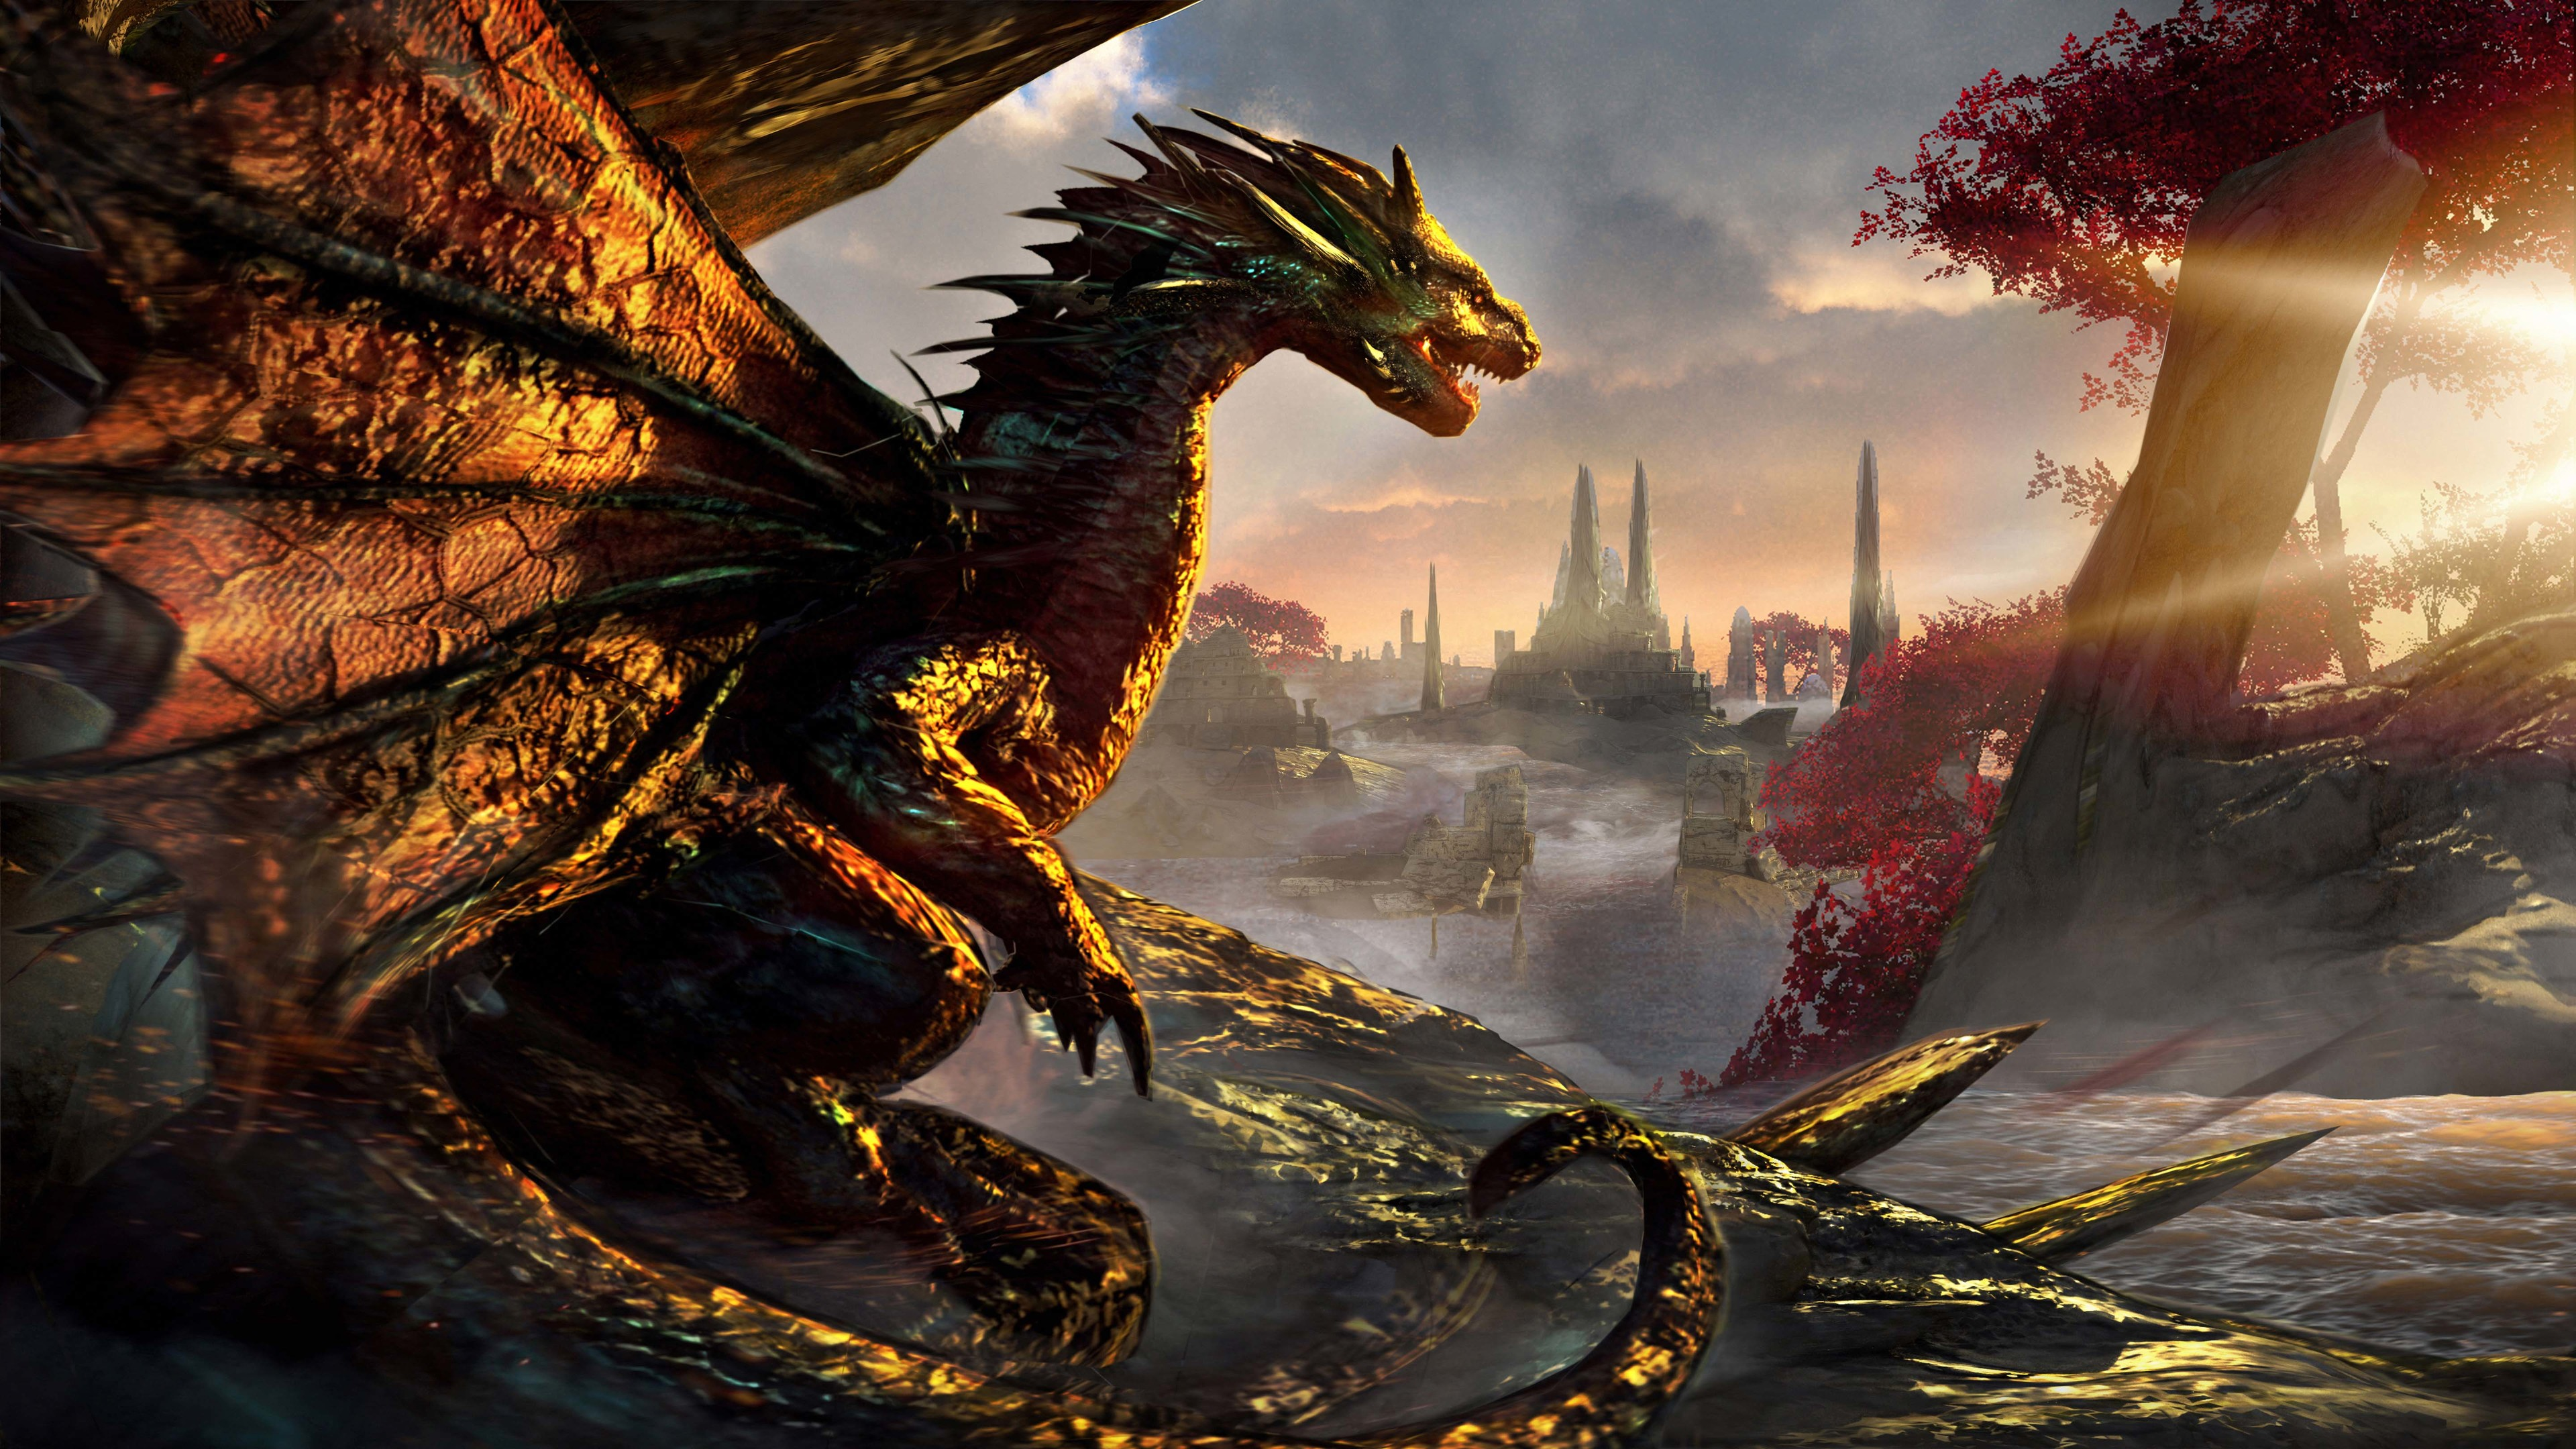 dawn of dragons artwork 4k 1540755507 - Dawn Of Dragons Artwork 4k - hd-wallpapers, digital art wallpapers, deviantart wallpapers, artist wallpapersartwork wallpapers, artist wallpapers, 4k-wallpapers